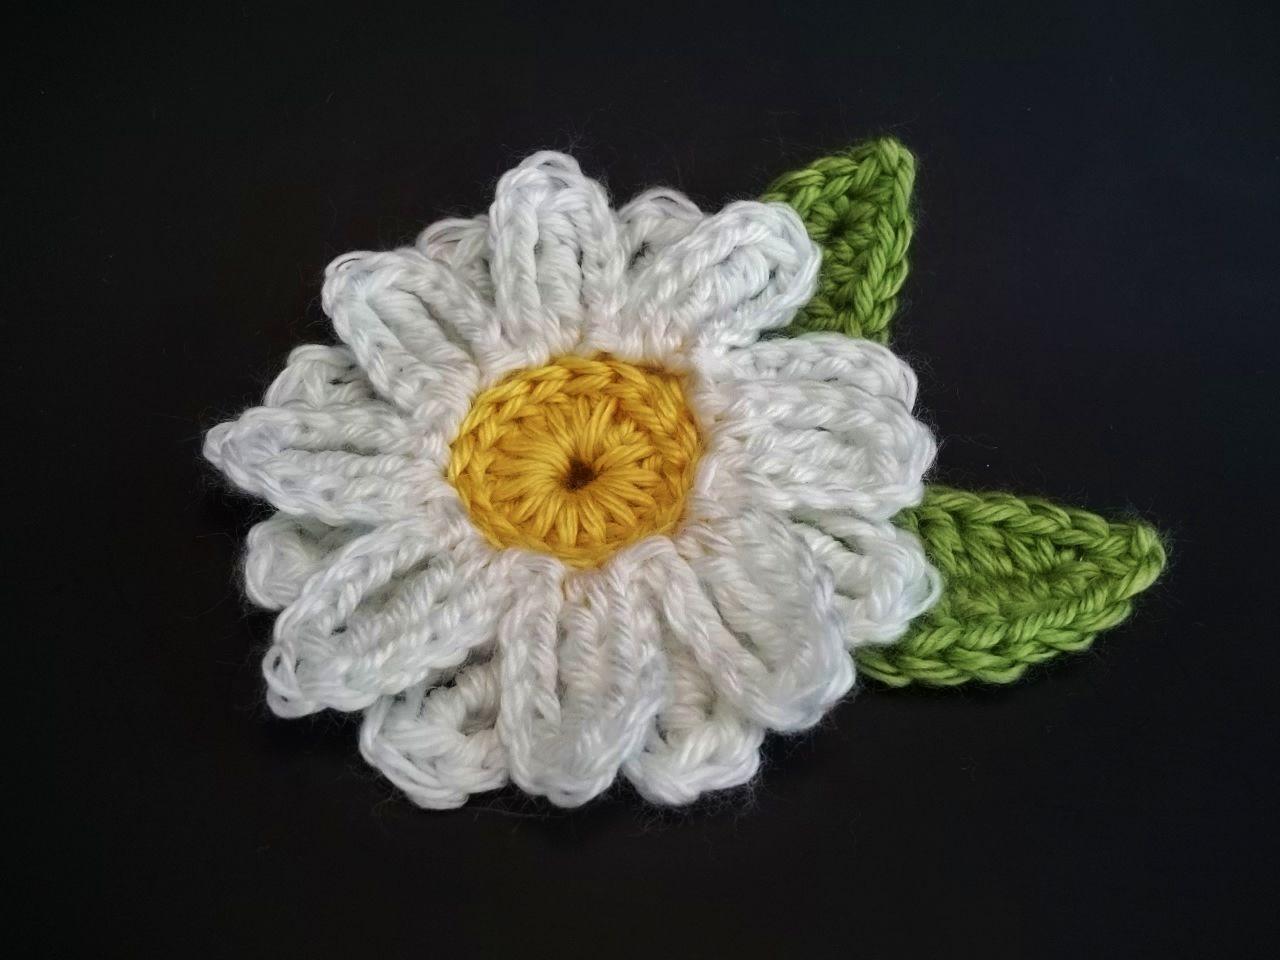 Crochet daisy patterns crochet for beginners crochet patterns crochet daisy patterns crochet for beginners izmirmasajfo